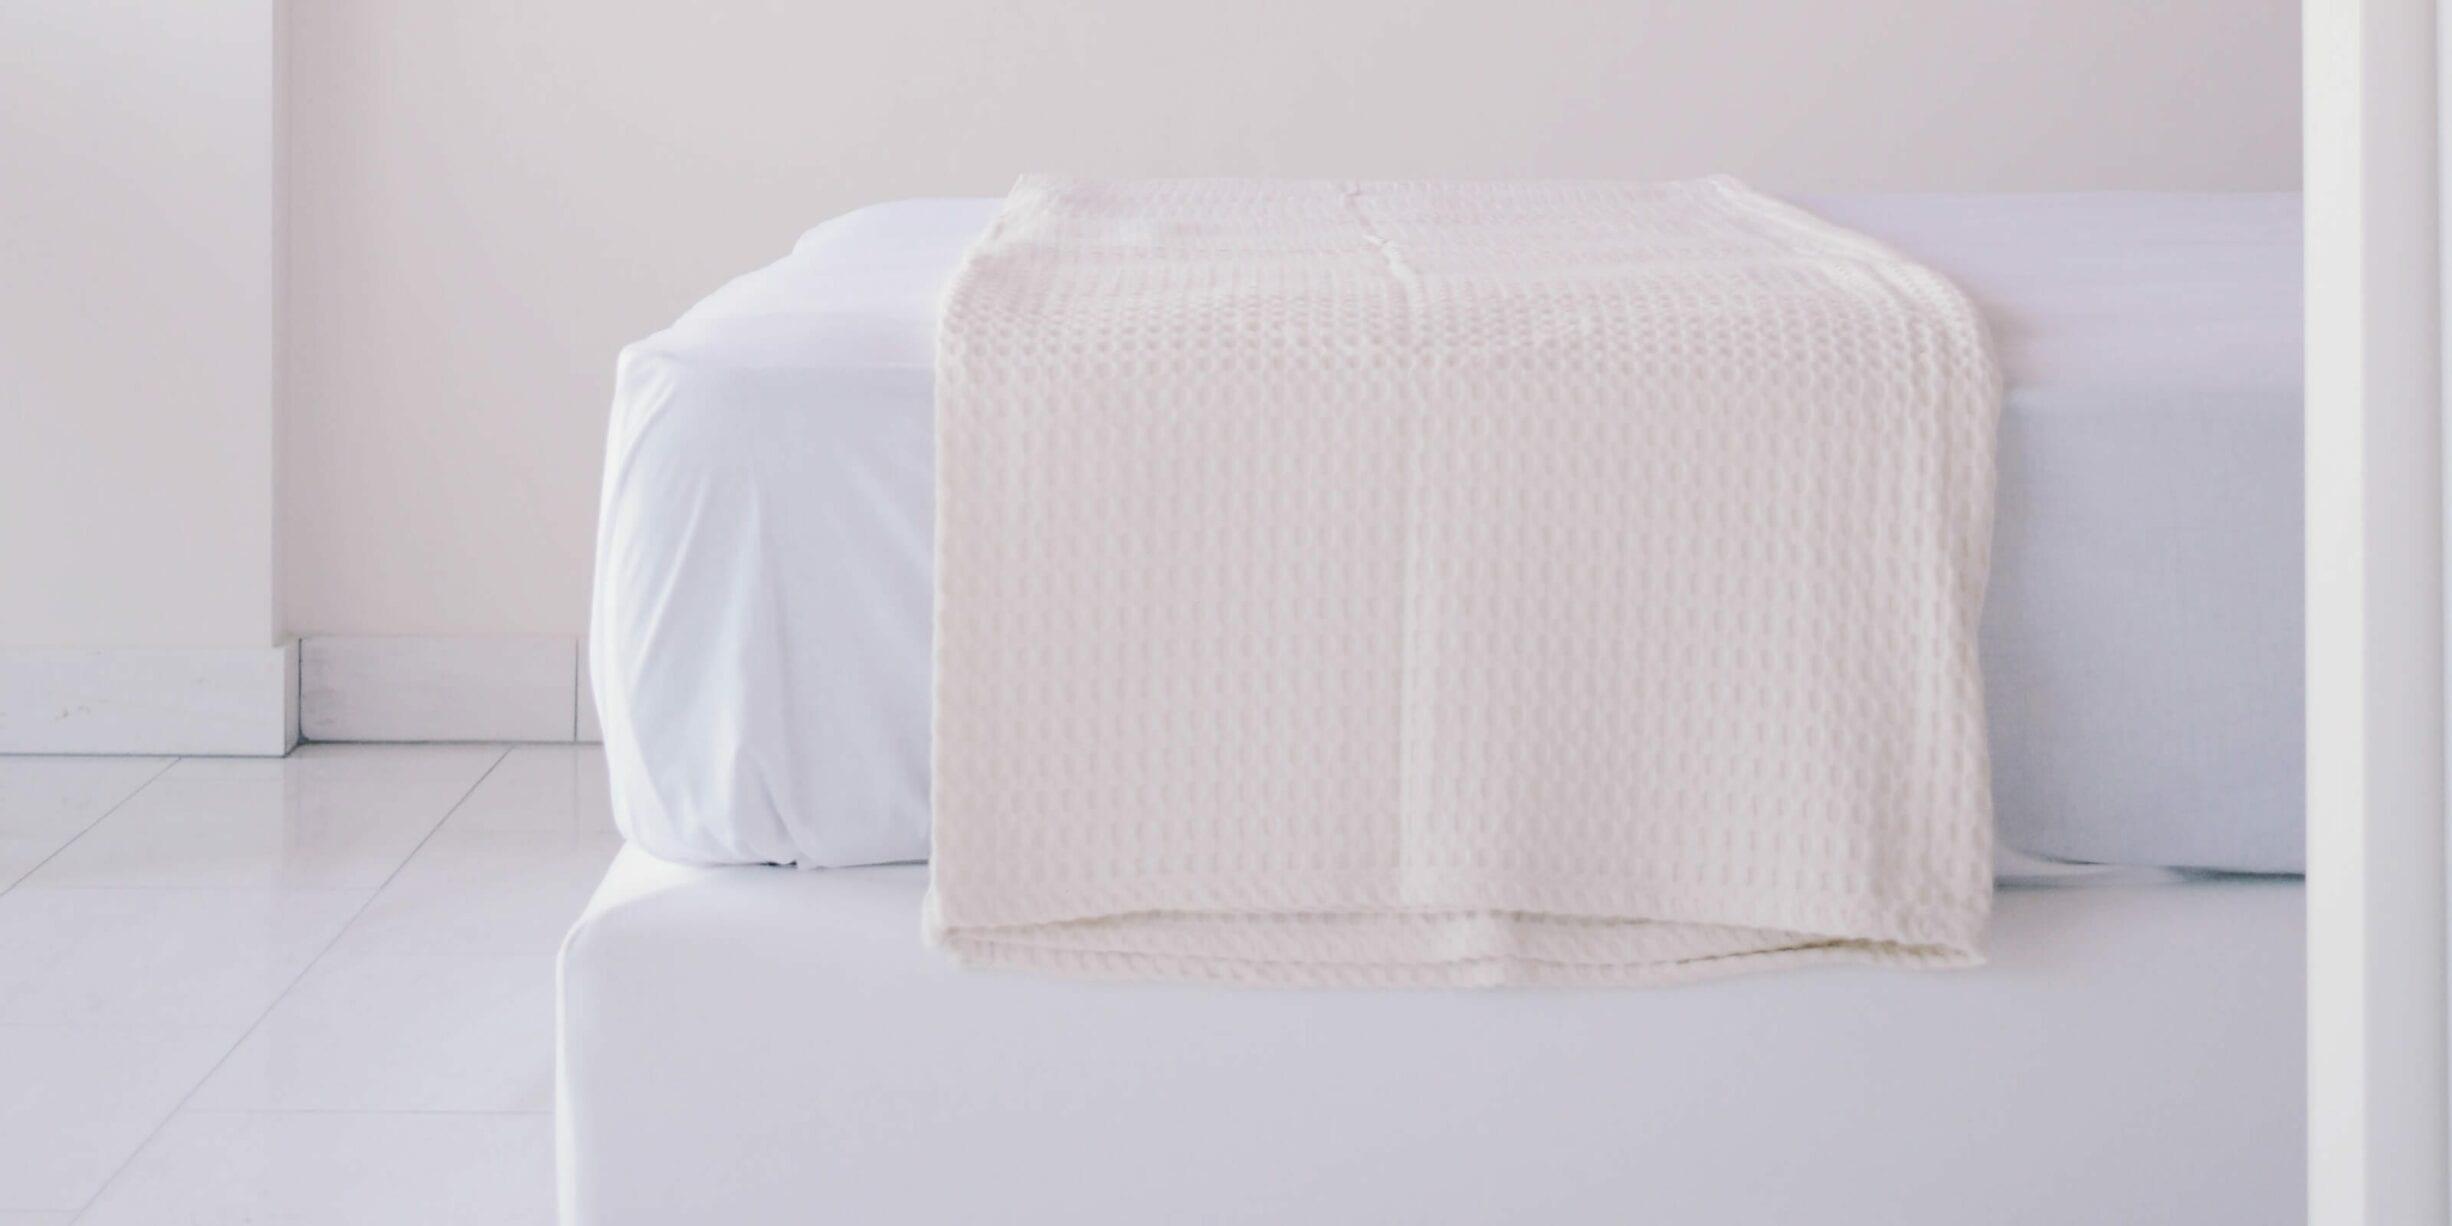 mattress, bed frame, duvet cover